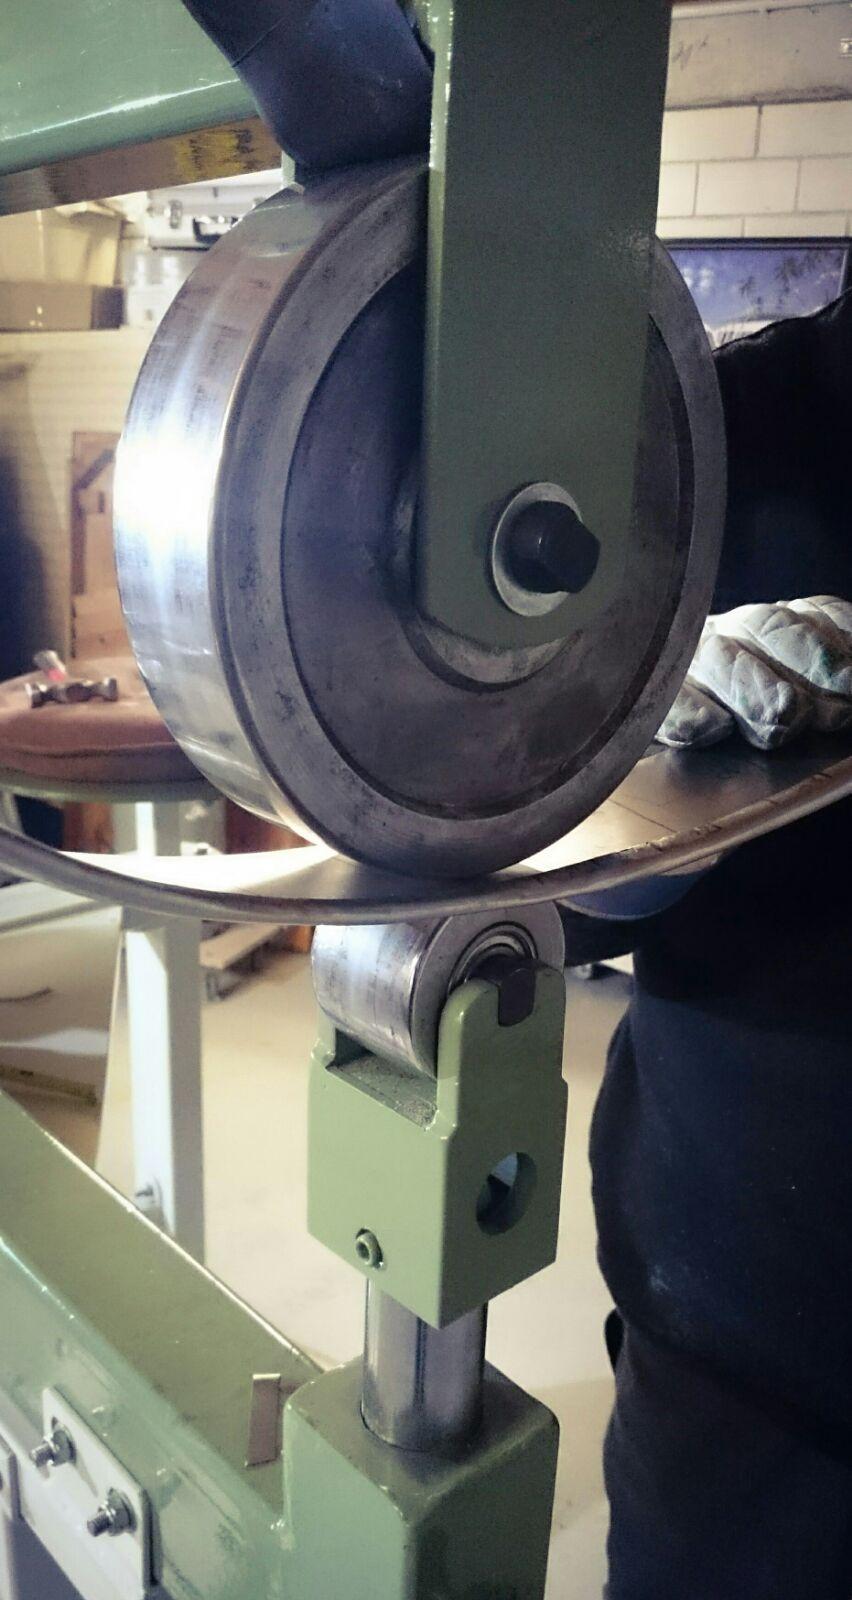 Mit dem English-Wheel lässt sich das Blech sehr gut glätten.